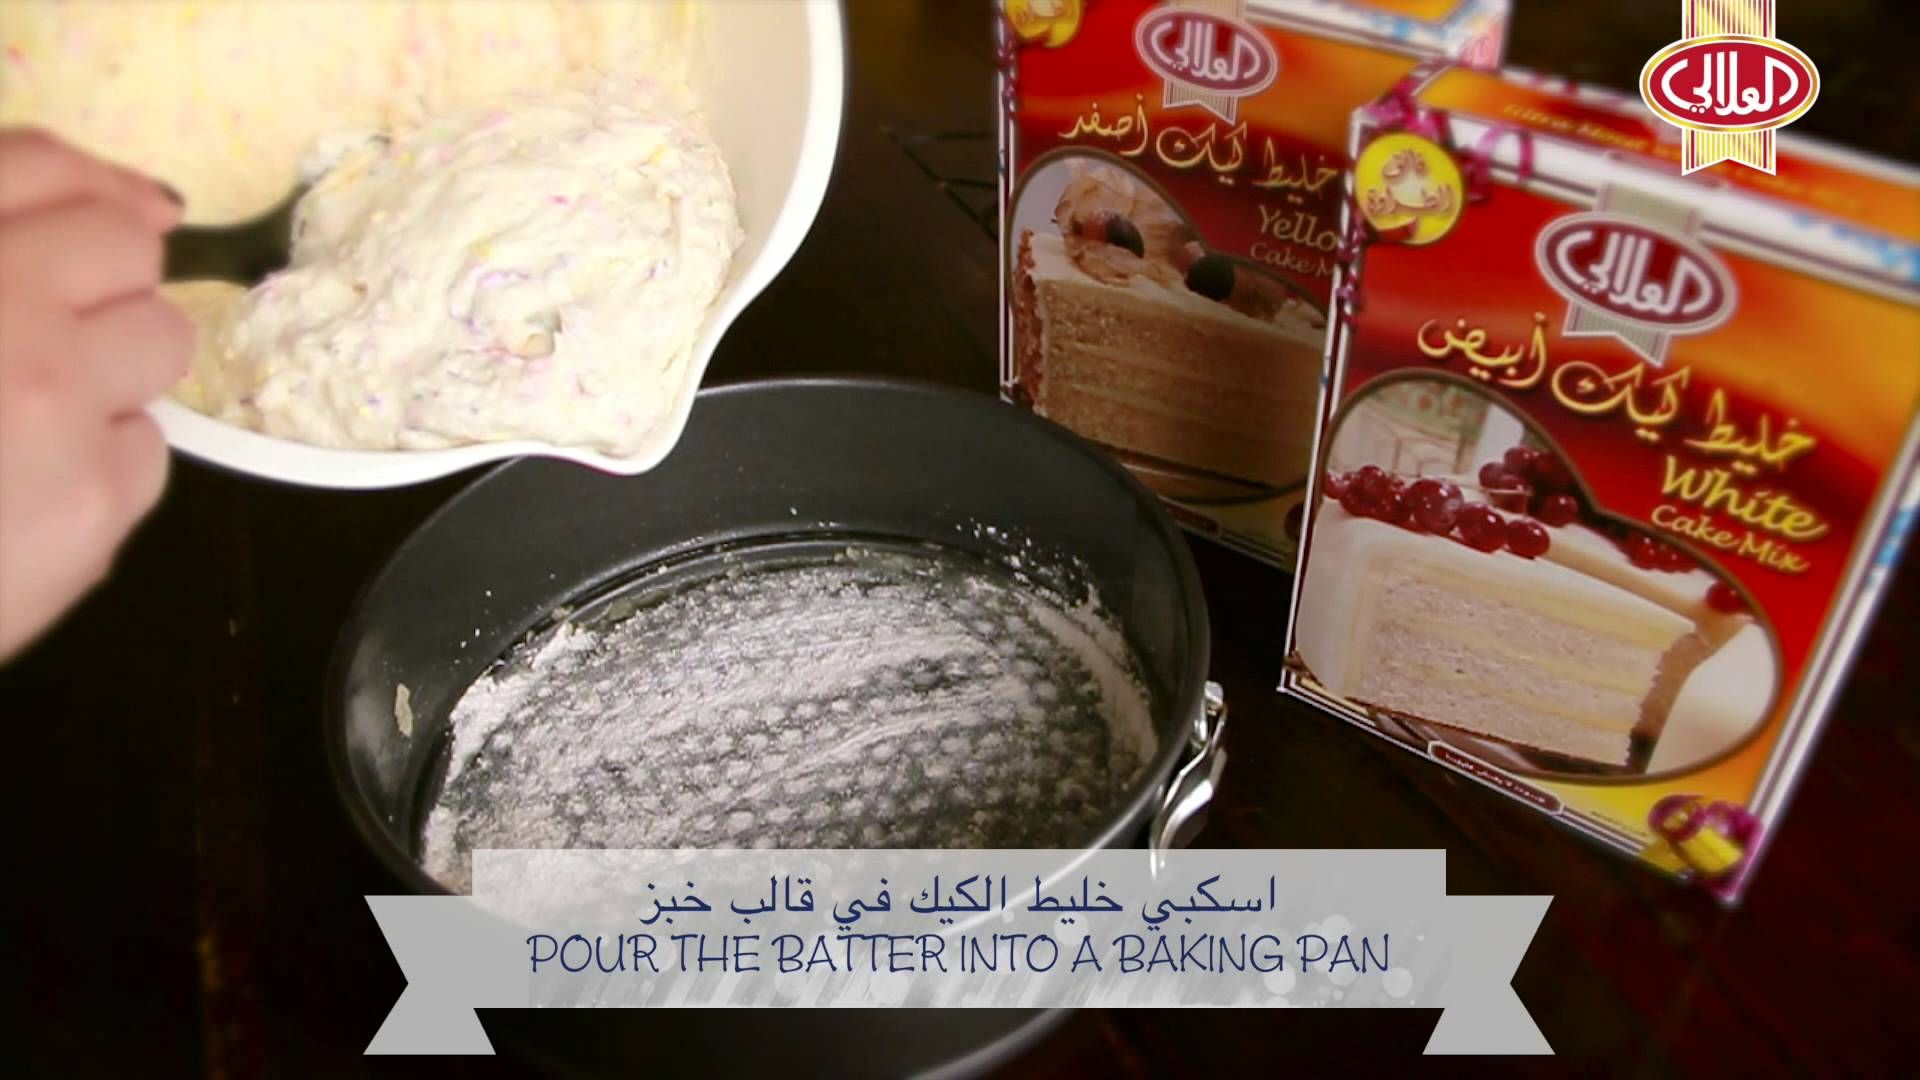 Pin On Culinary Skills مهارات الطهي